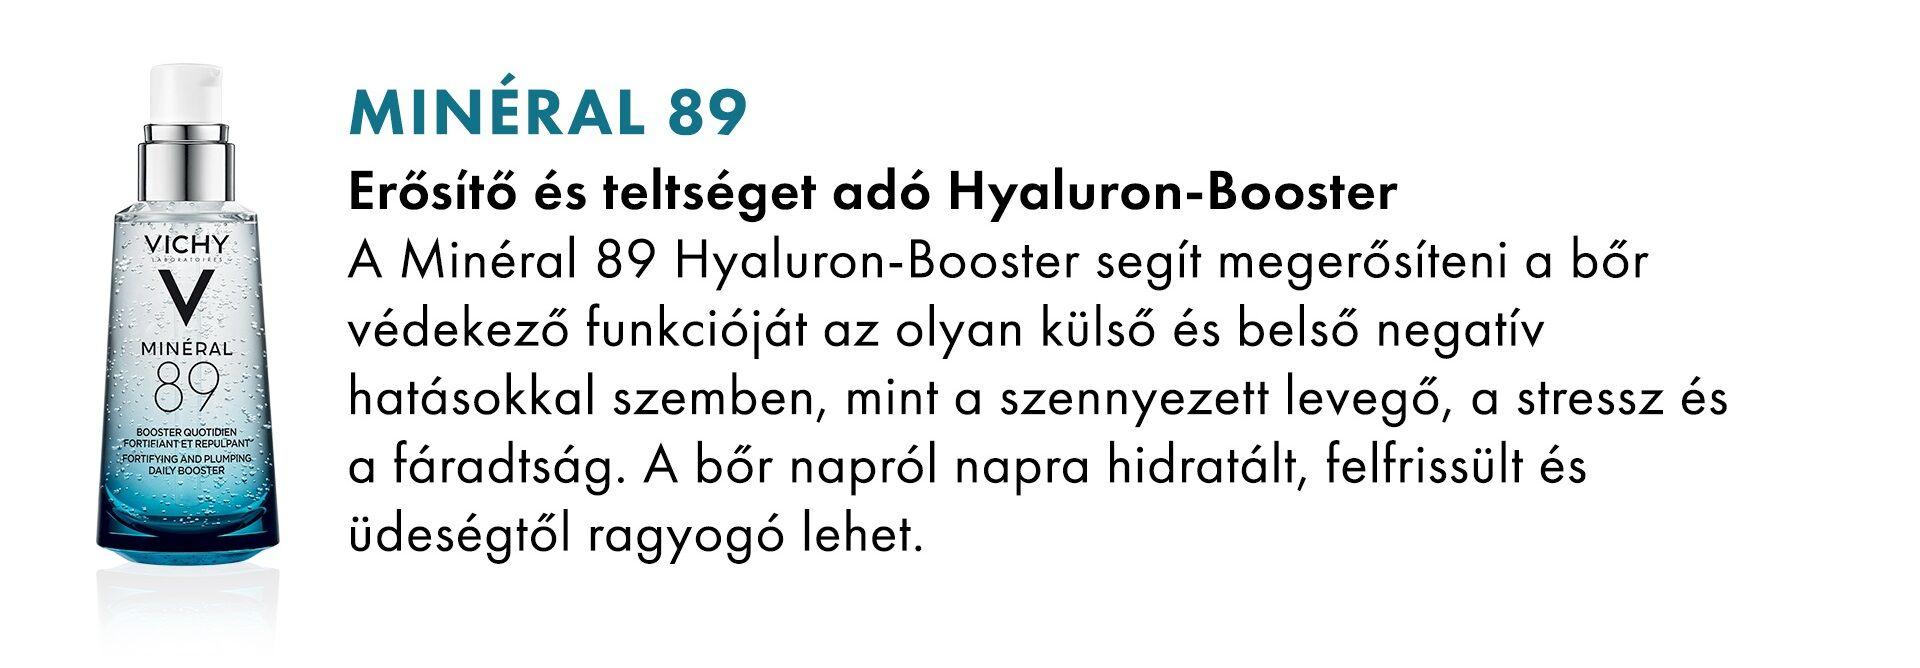 Vichy Minéral 89 Hyaluron Booster arcápoló